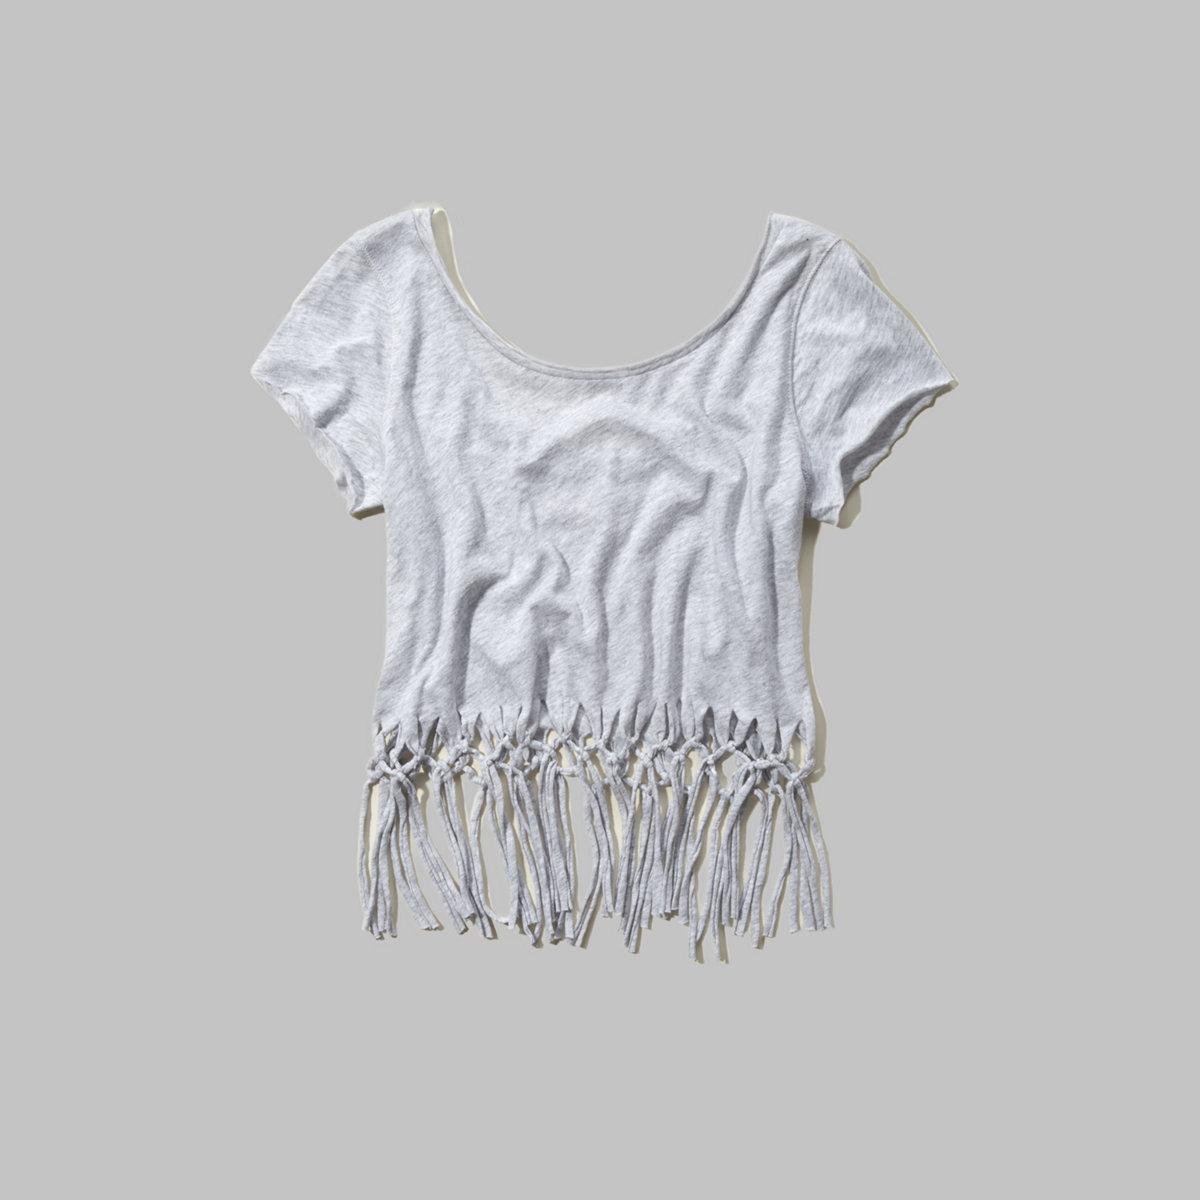 Woodson Mountain T-Shirt